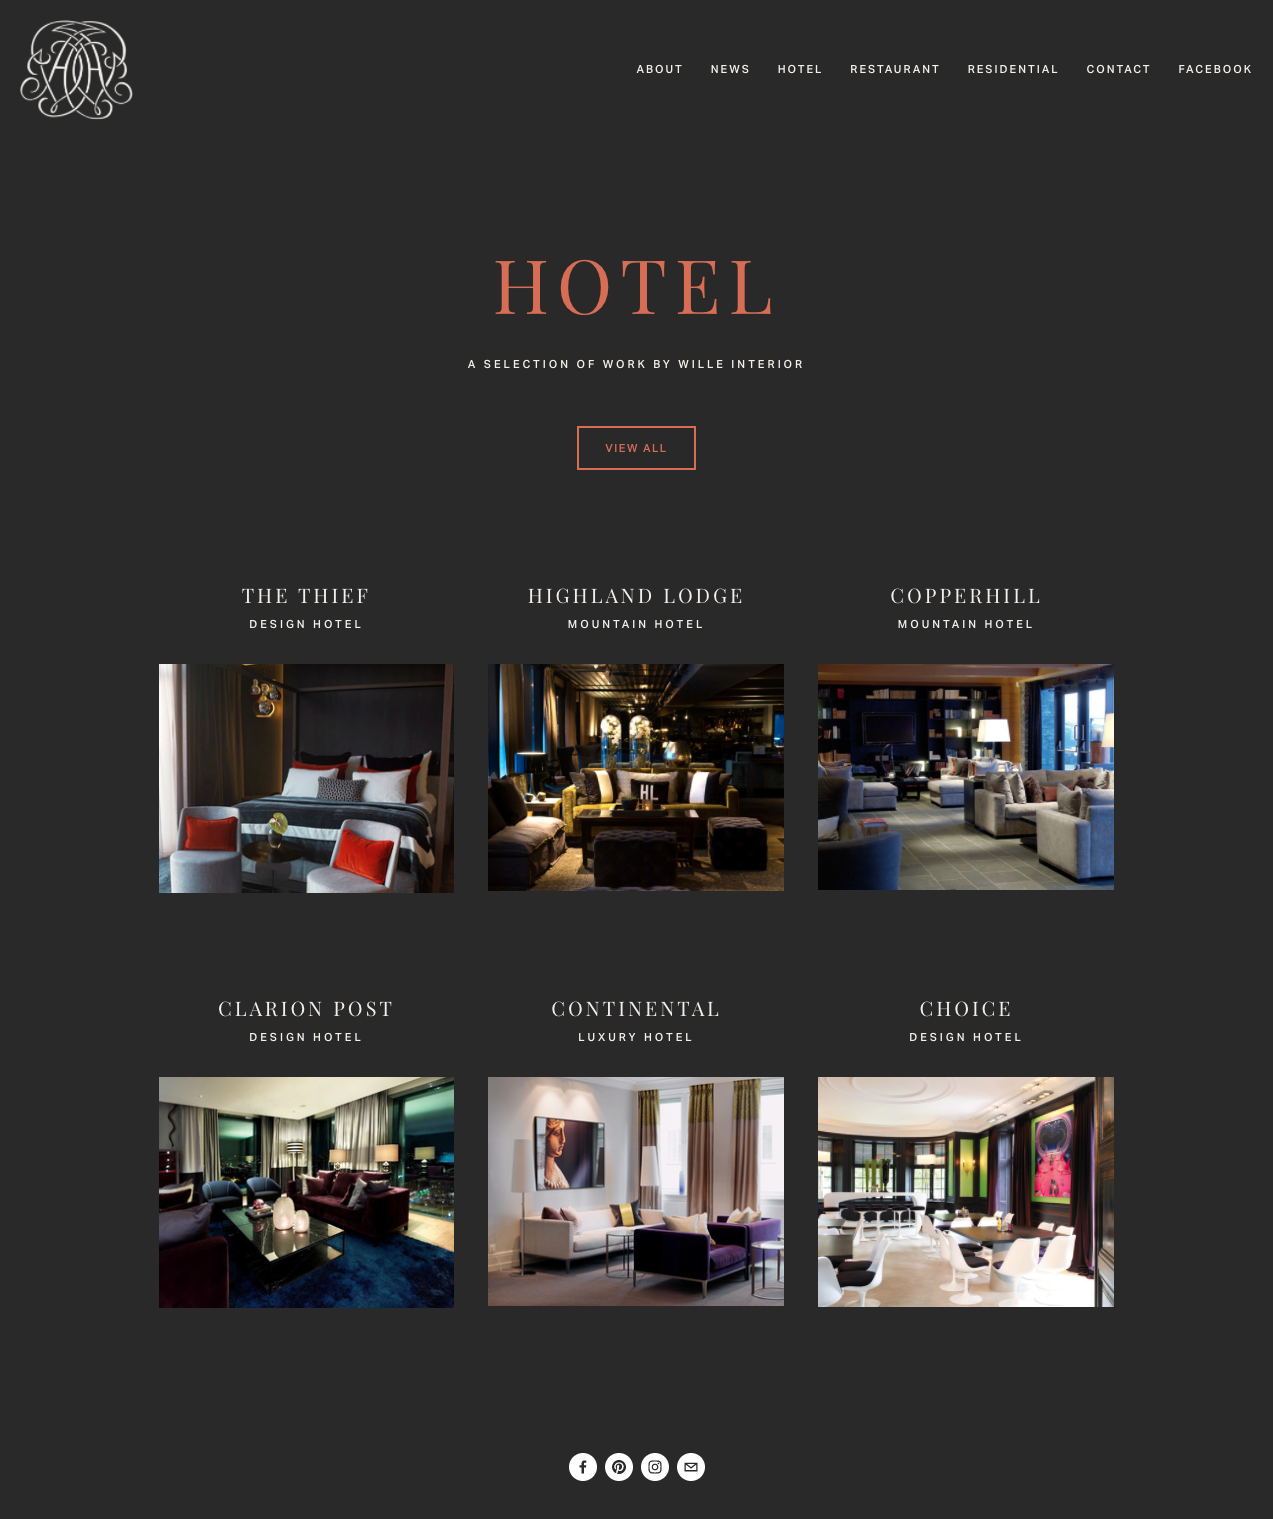 screencapture-anemone-no-hotelmain-1509962642143.png